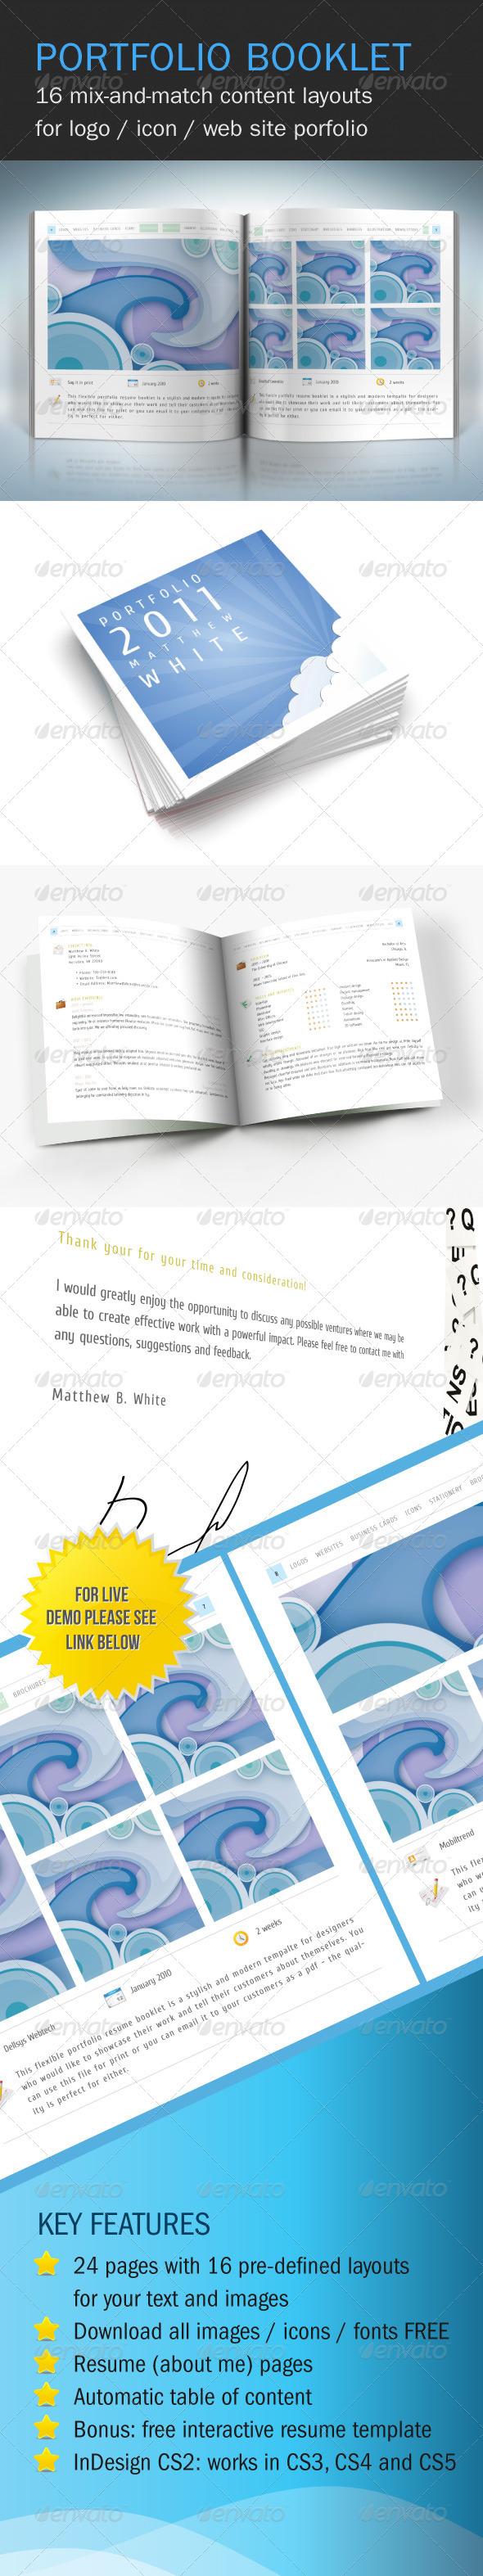 Flexible Portfolio Booklet with Resume - Portfolio Brochures